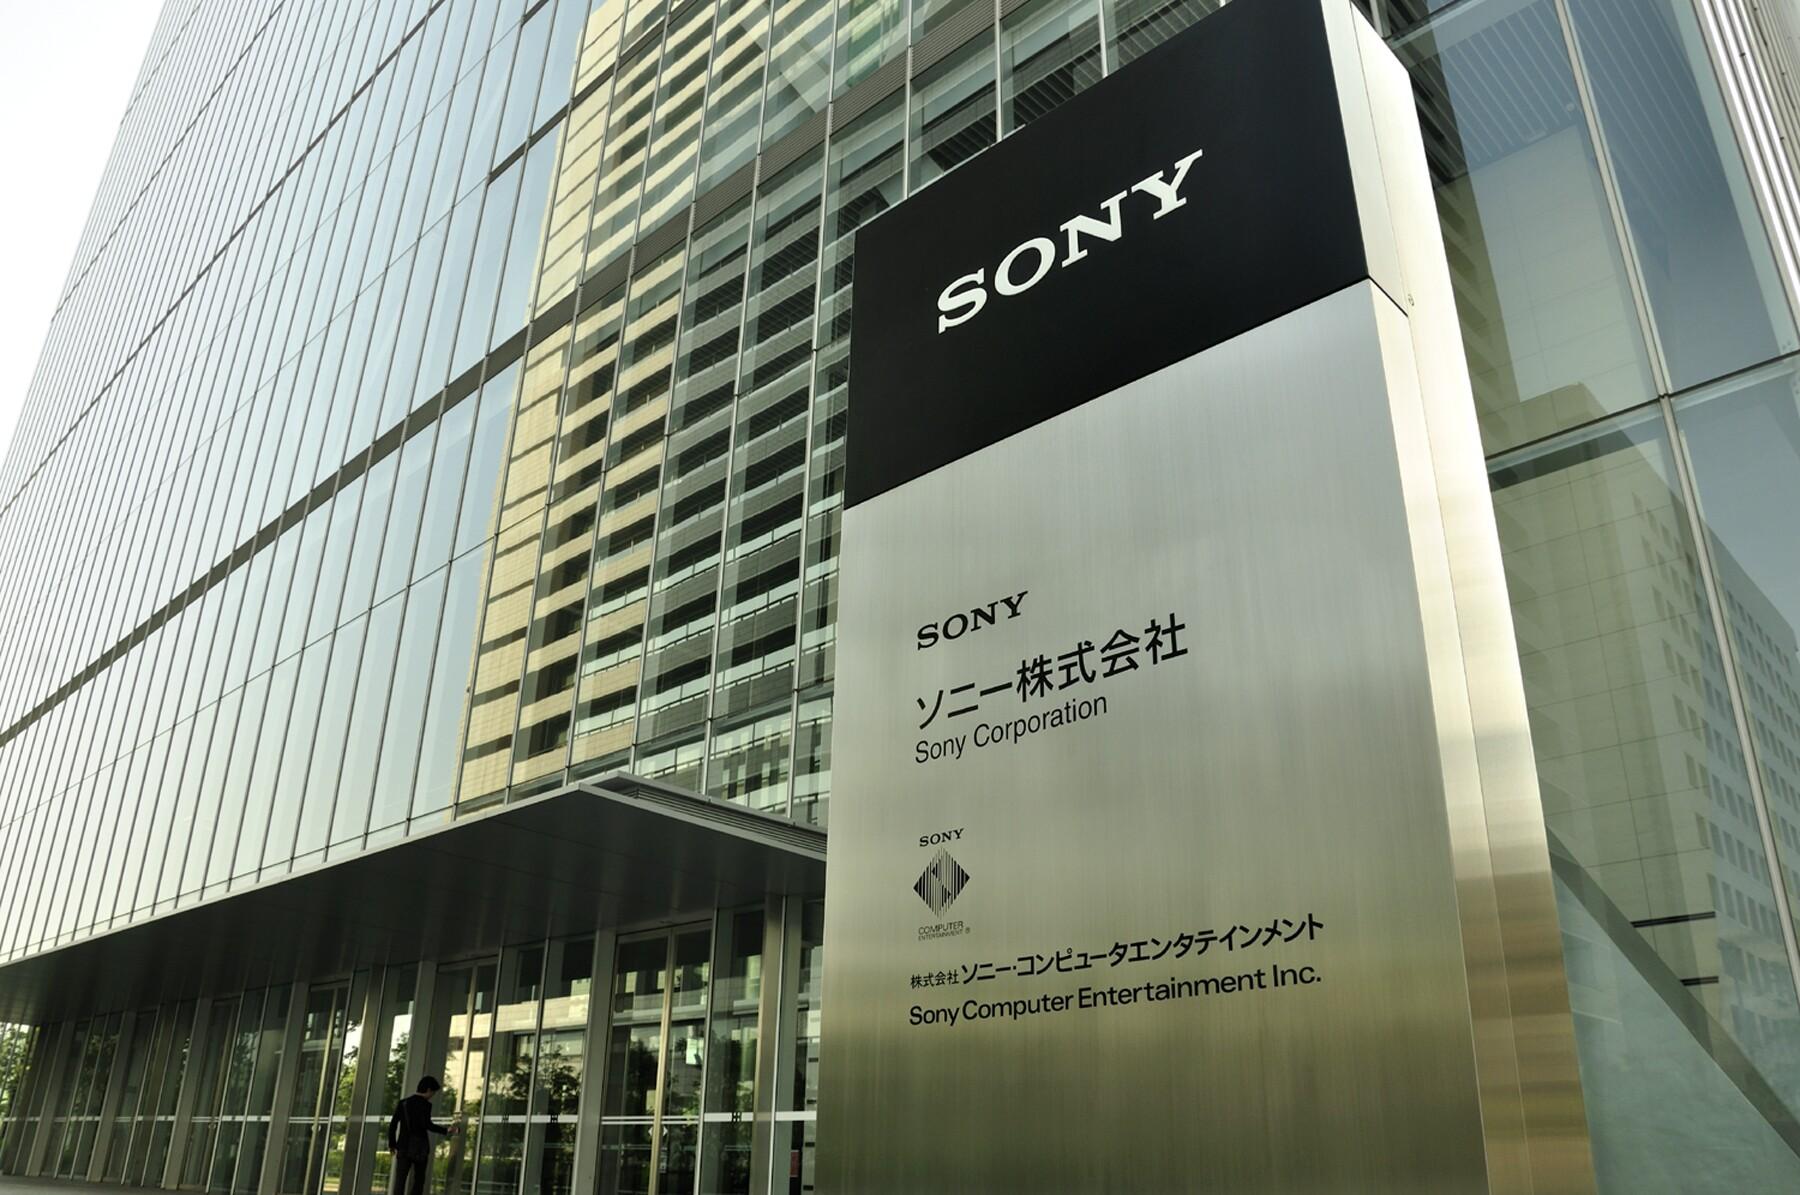 Sony Office Plaque